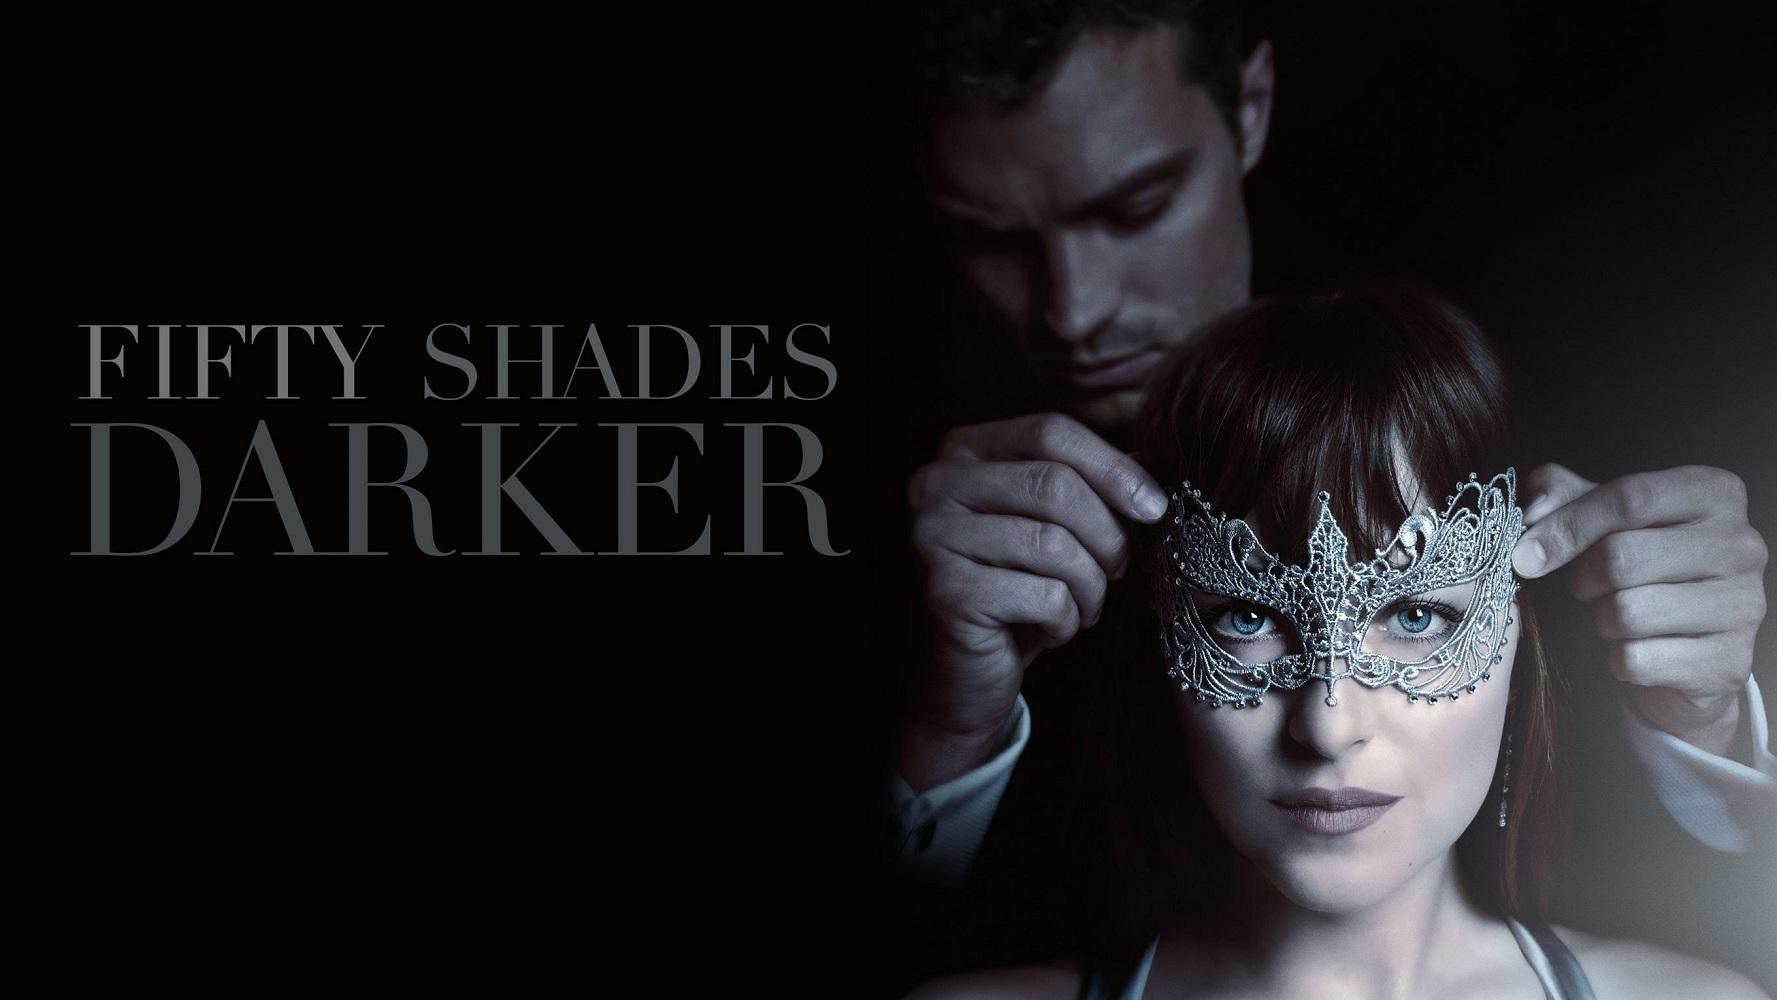 Verleidelijk: Trailer FIFTY SHADES DARKER meest bekeken trailer